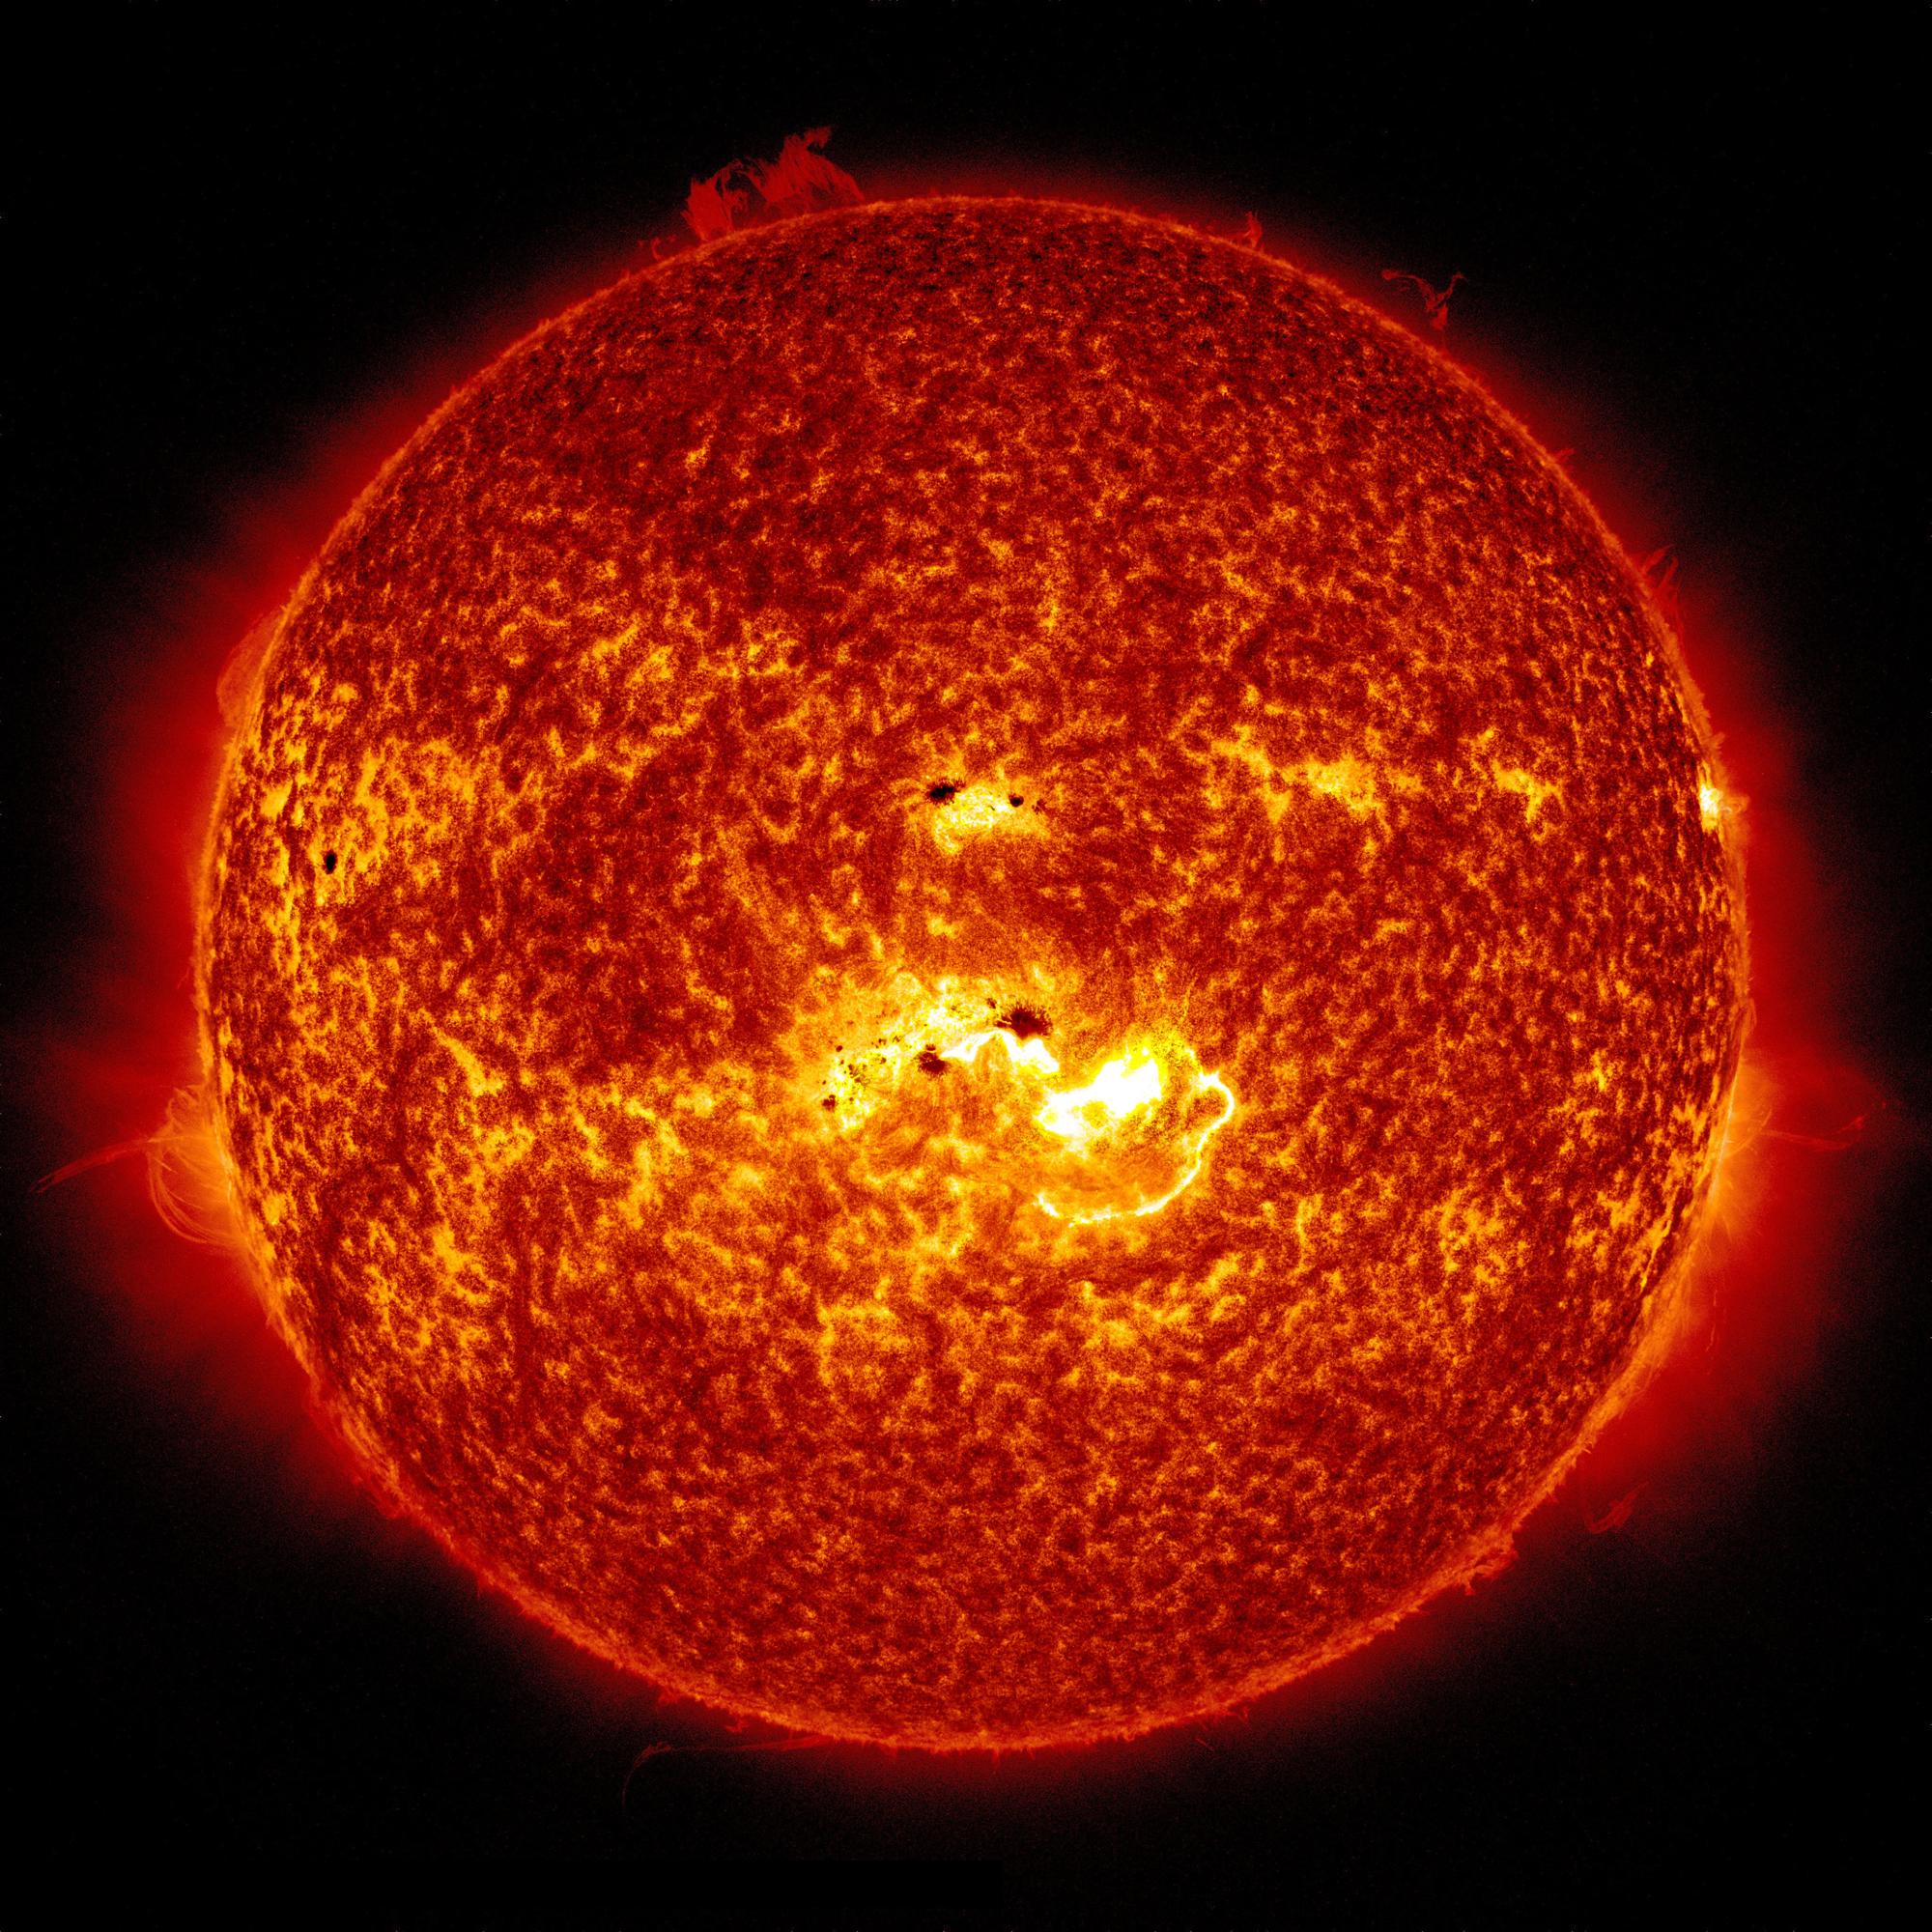 X1.2 Solar Flare Full Sun: Jan. 7, 2014